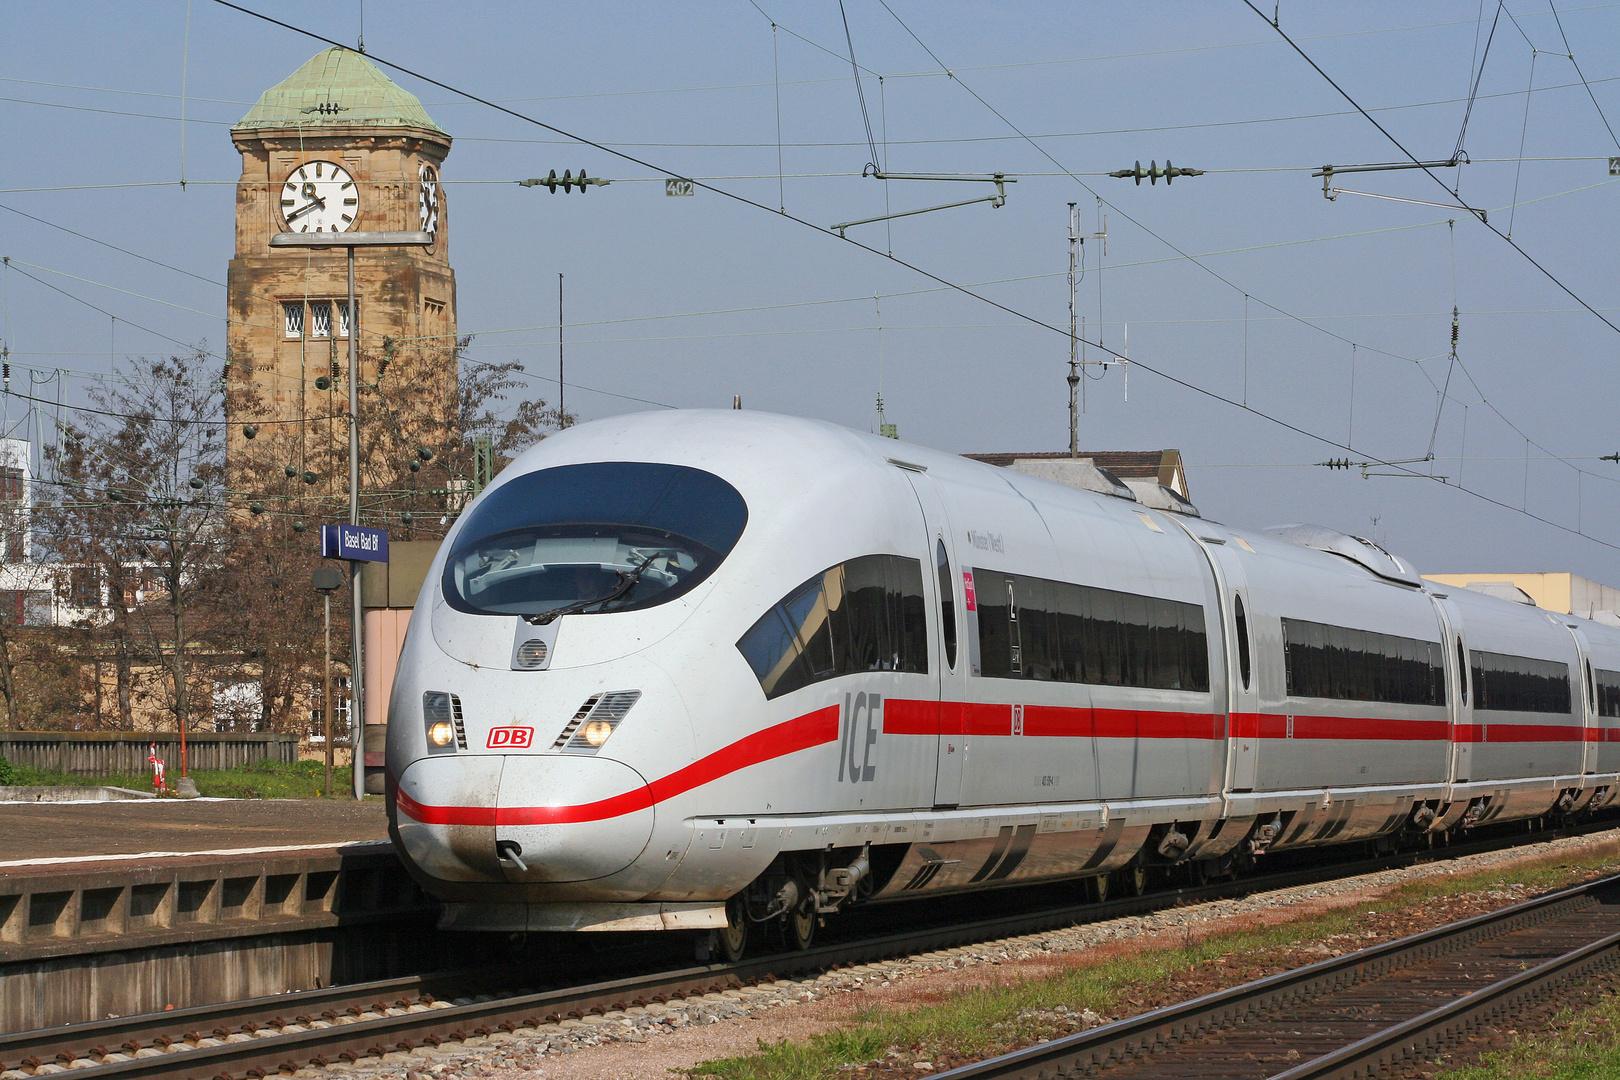 Endspurt für ICE 501  (403 518) in Basel Bad Bf